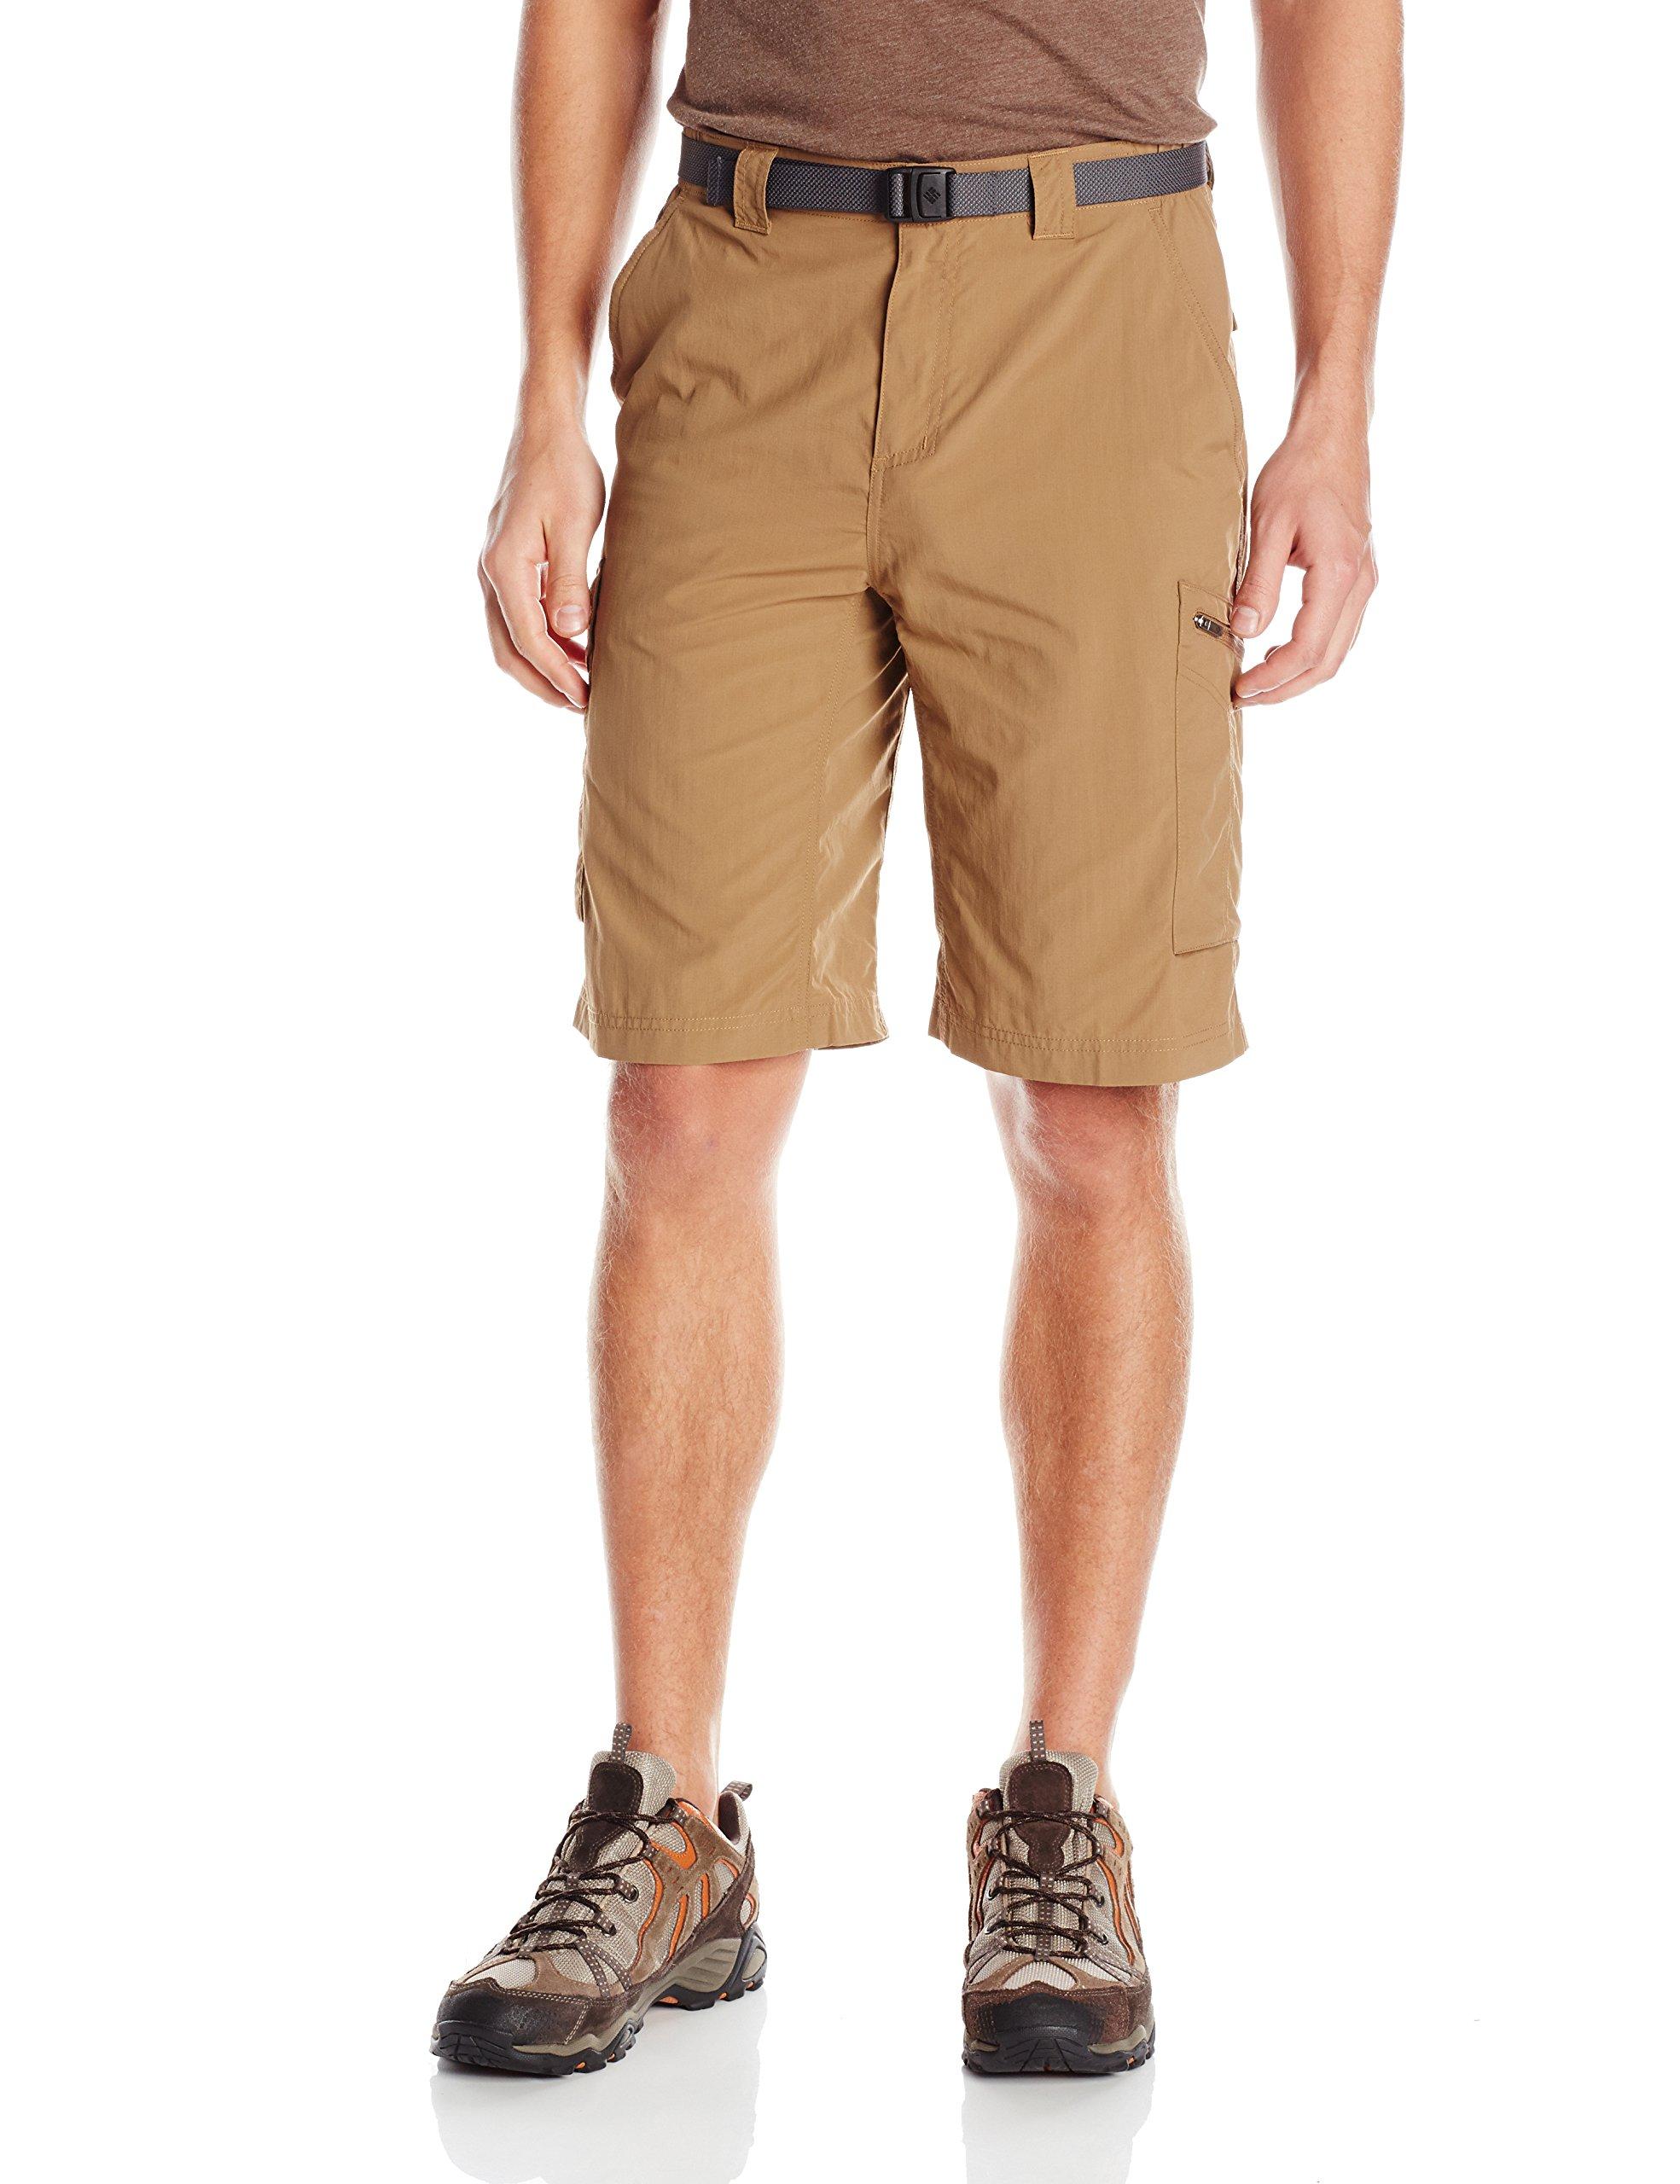 Columbia Sportswear Men's Silver Ridge Cargo Short, Delta, 30 x 12-Inch